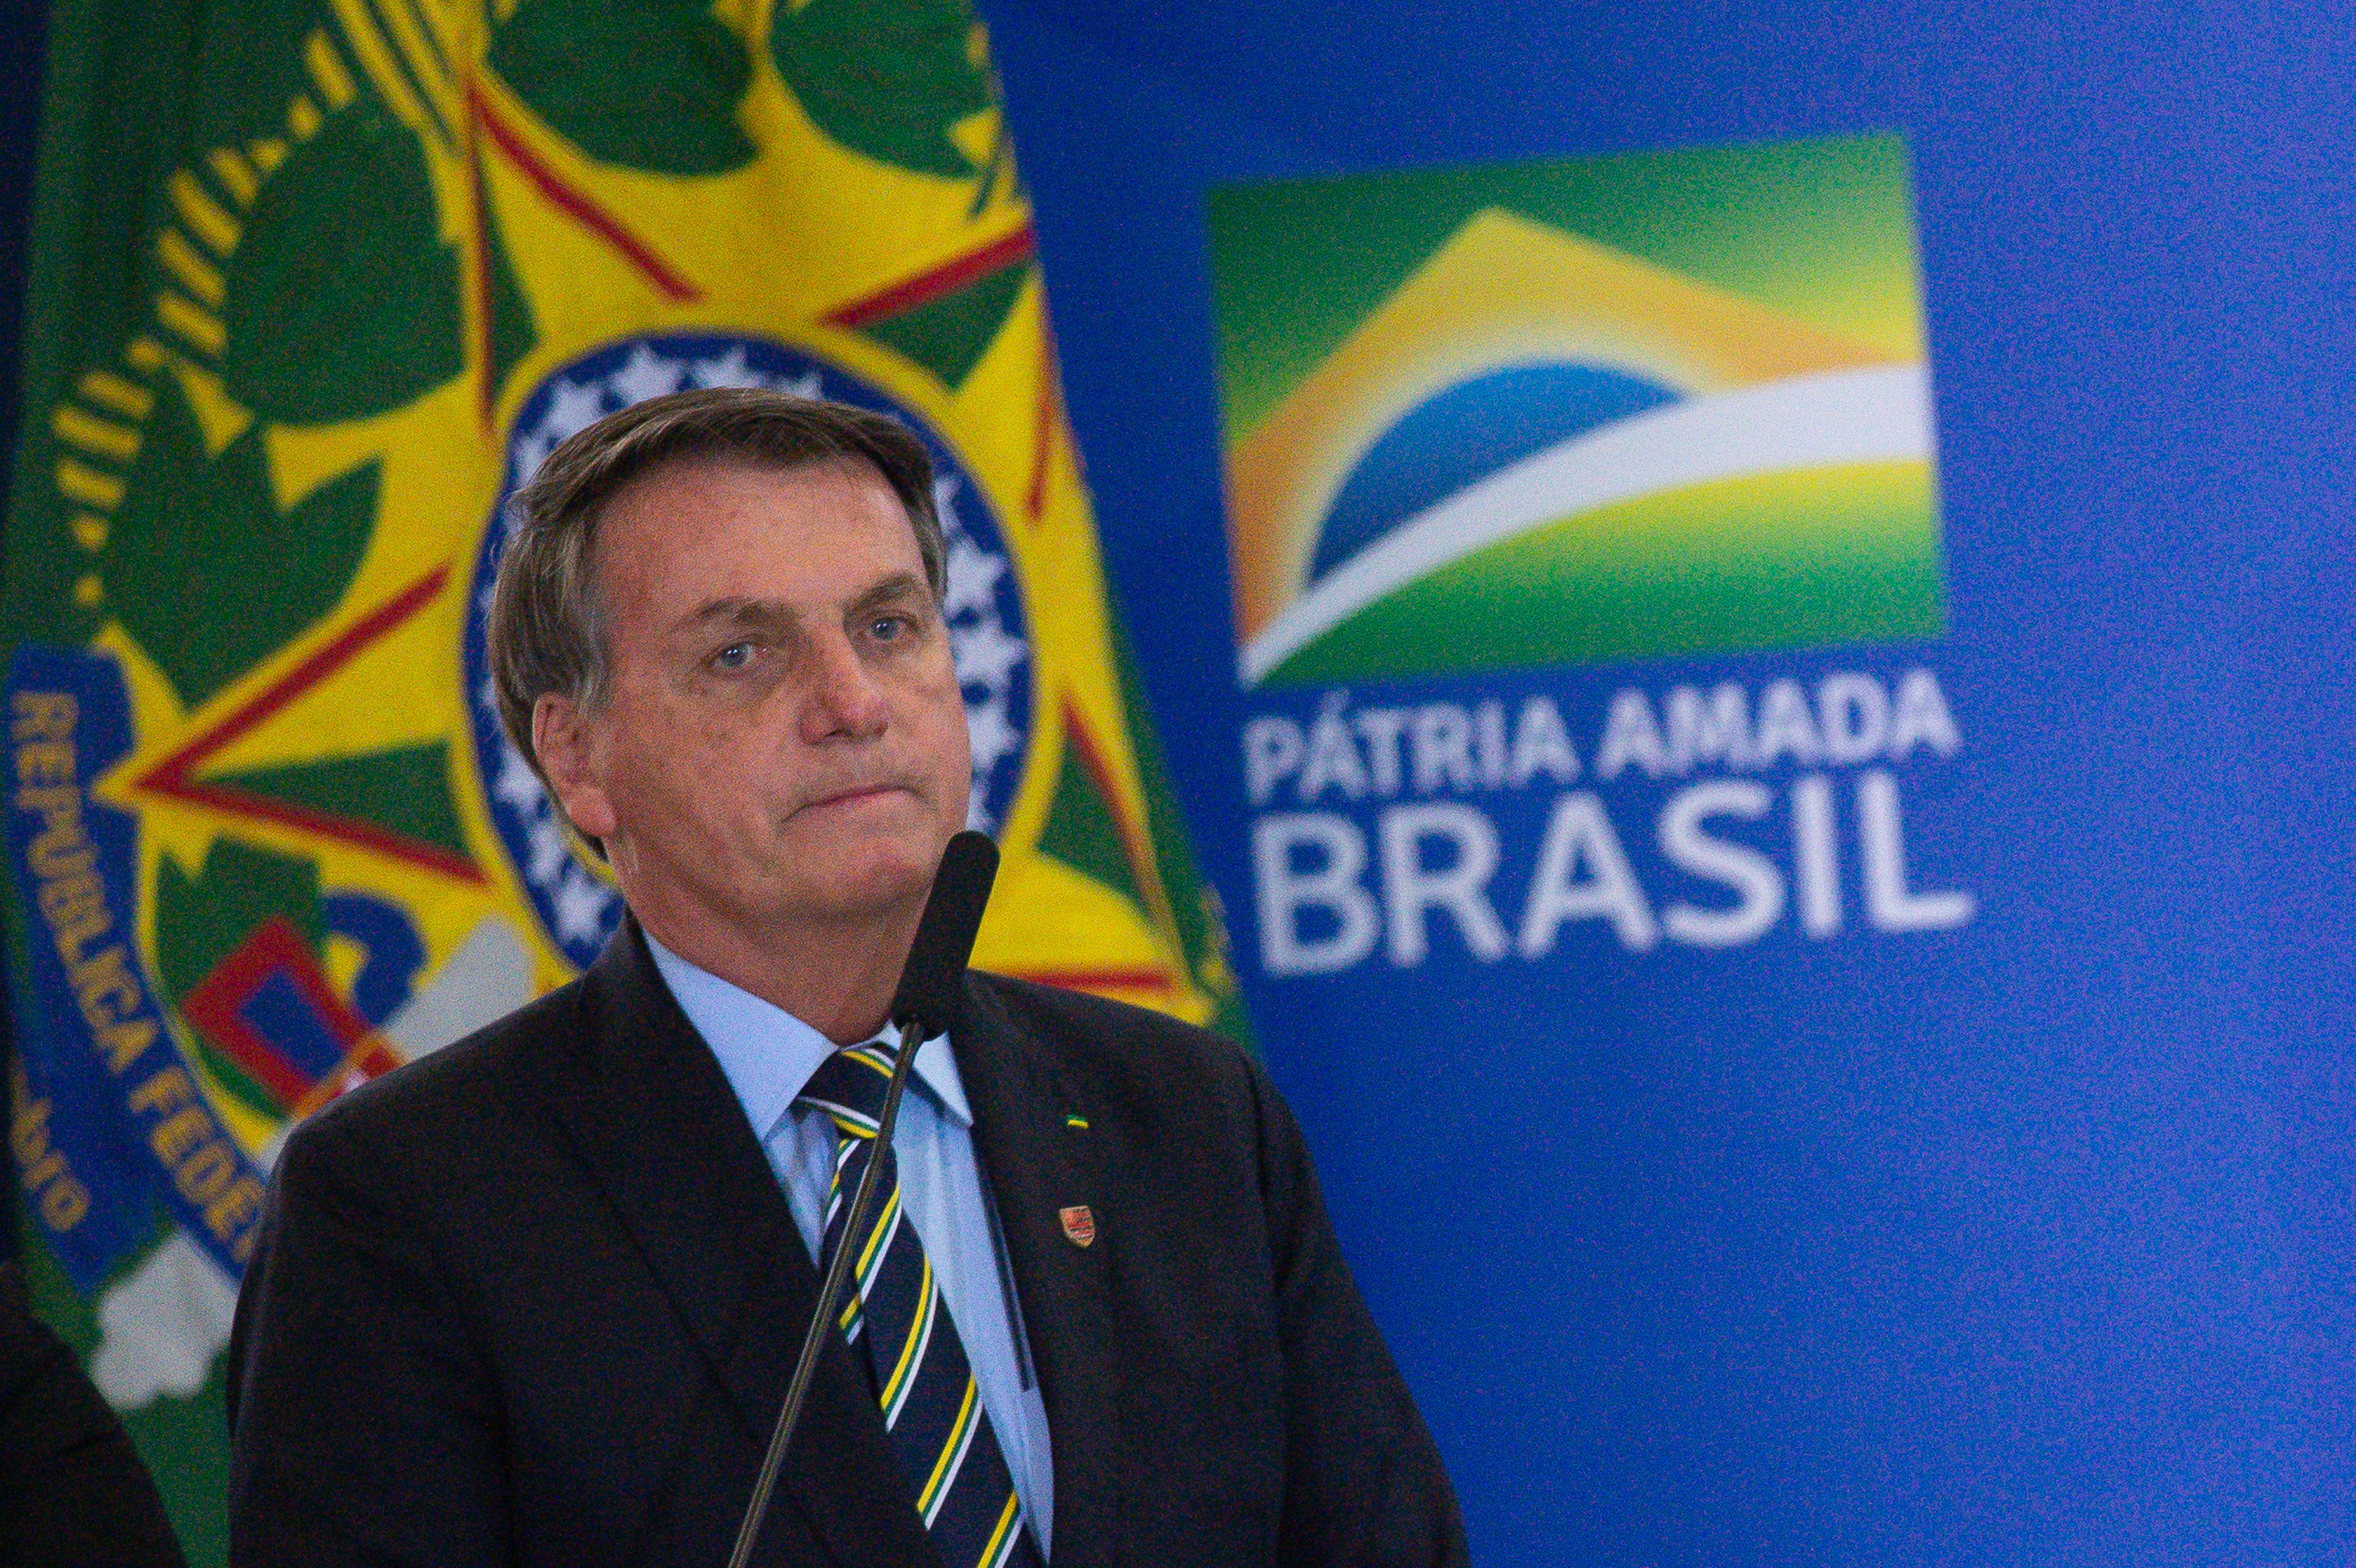 Brazilian President Bolsonaro undergoes MRI, COVID-19 test scheduled